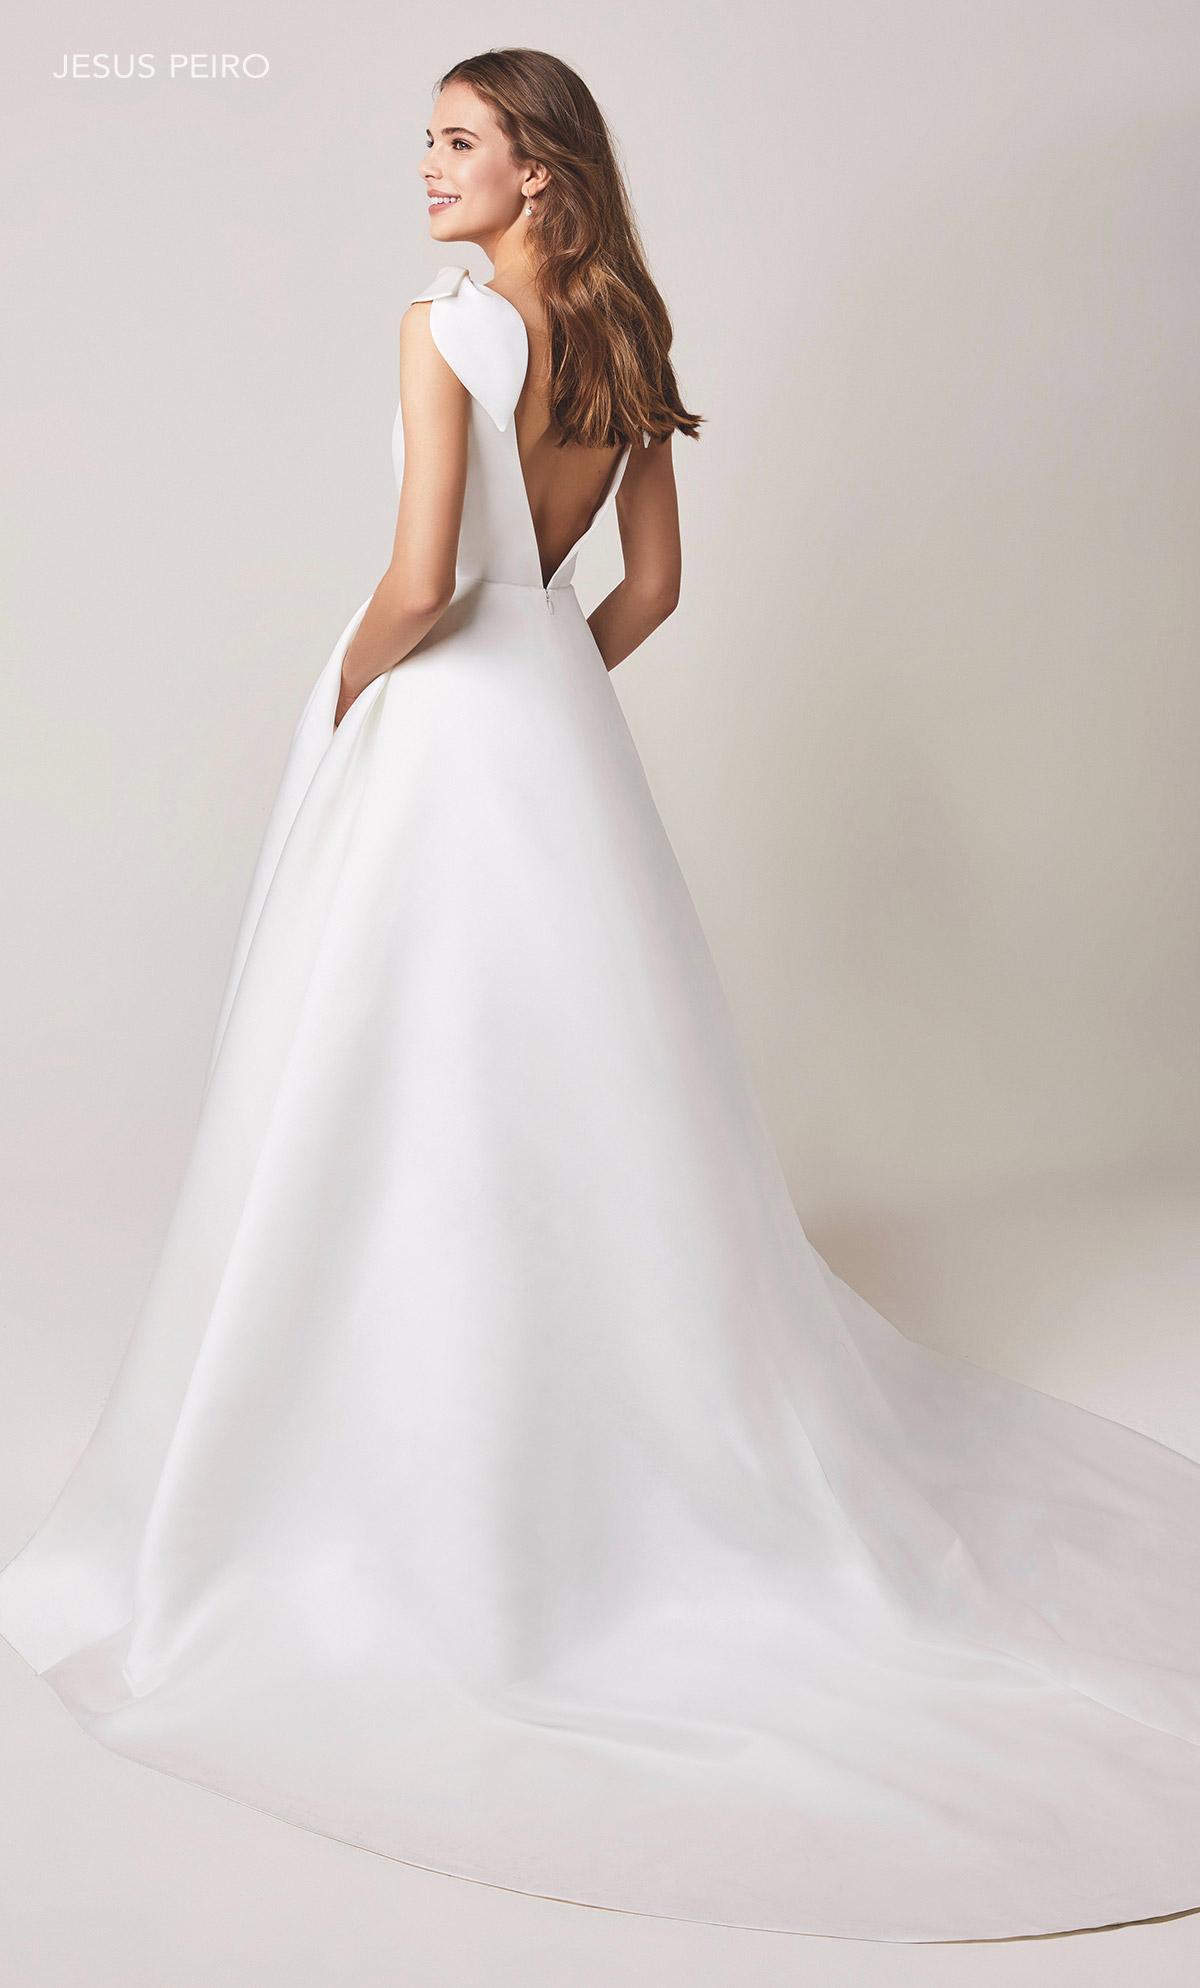 Vestido novia Jesús Peiró Ref.107